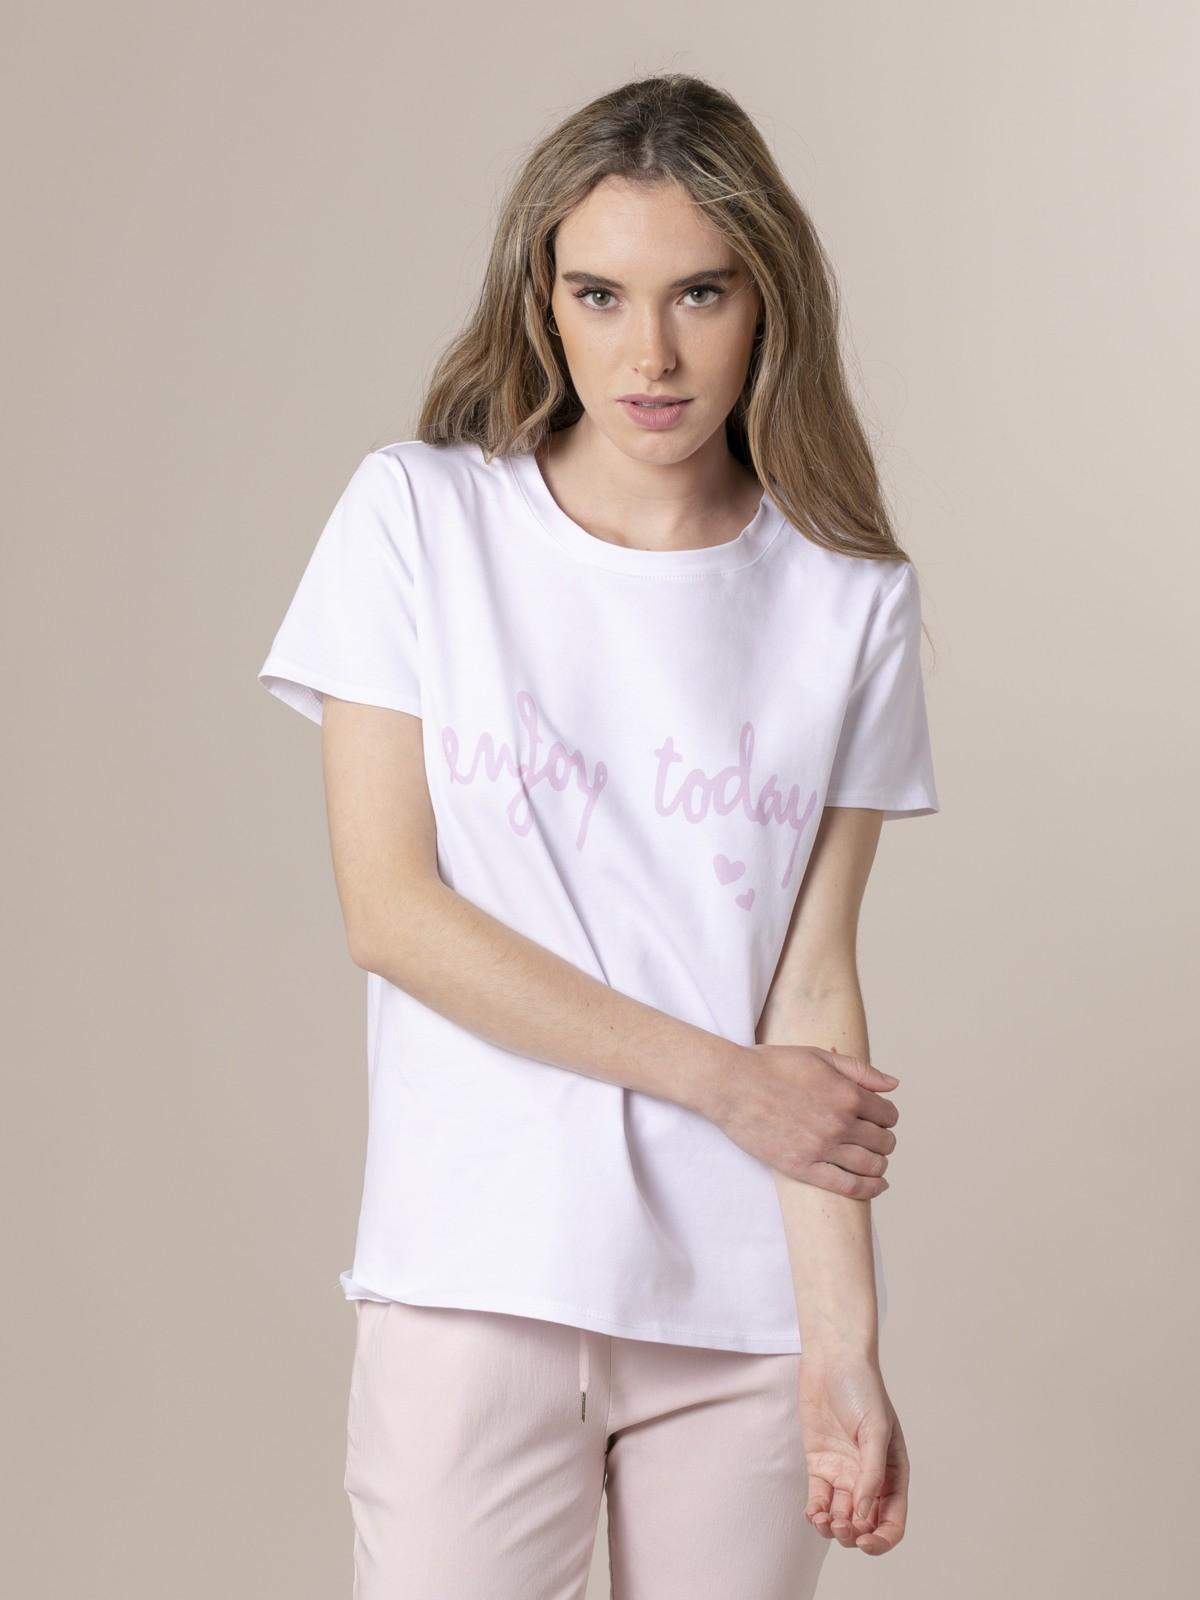 Woman Woman Enjoy today print T-shirt Pink